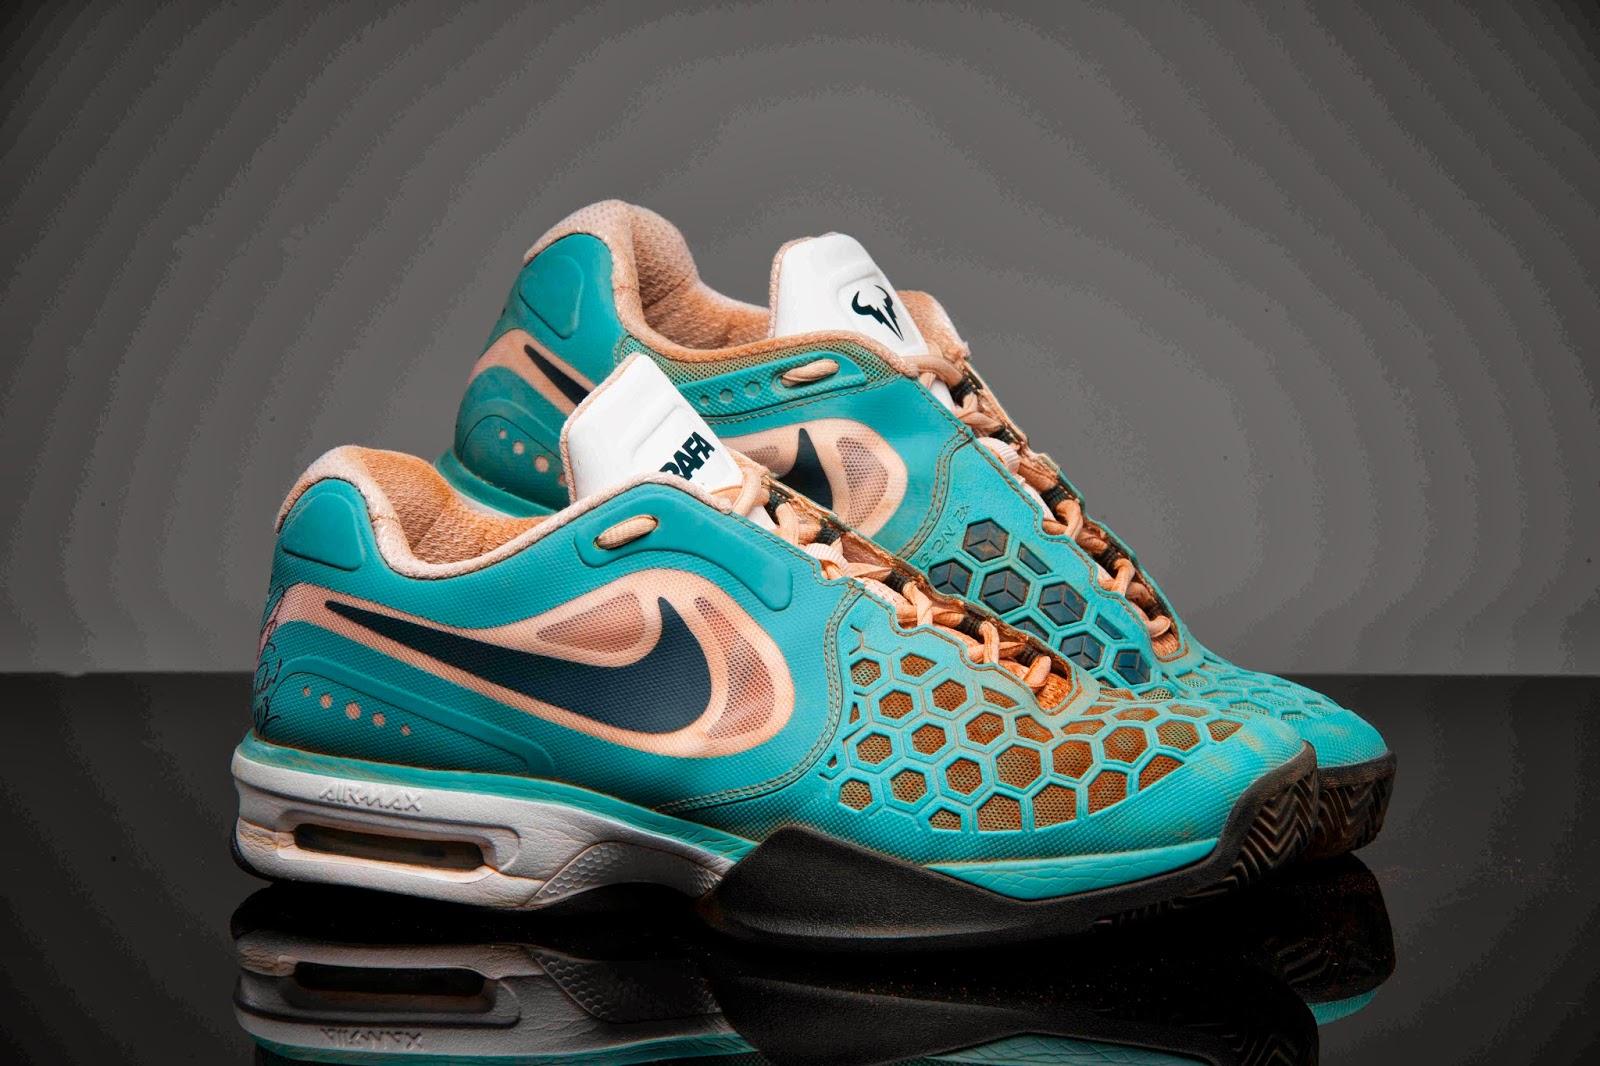 rafaholics rafa nadal donates tennis shoes for charity